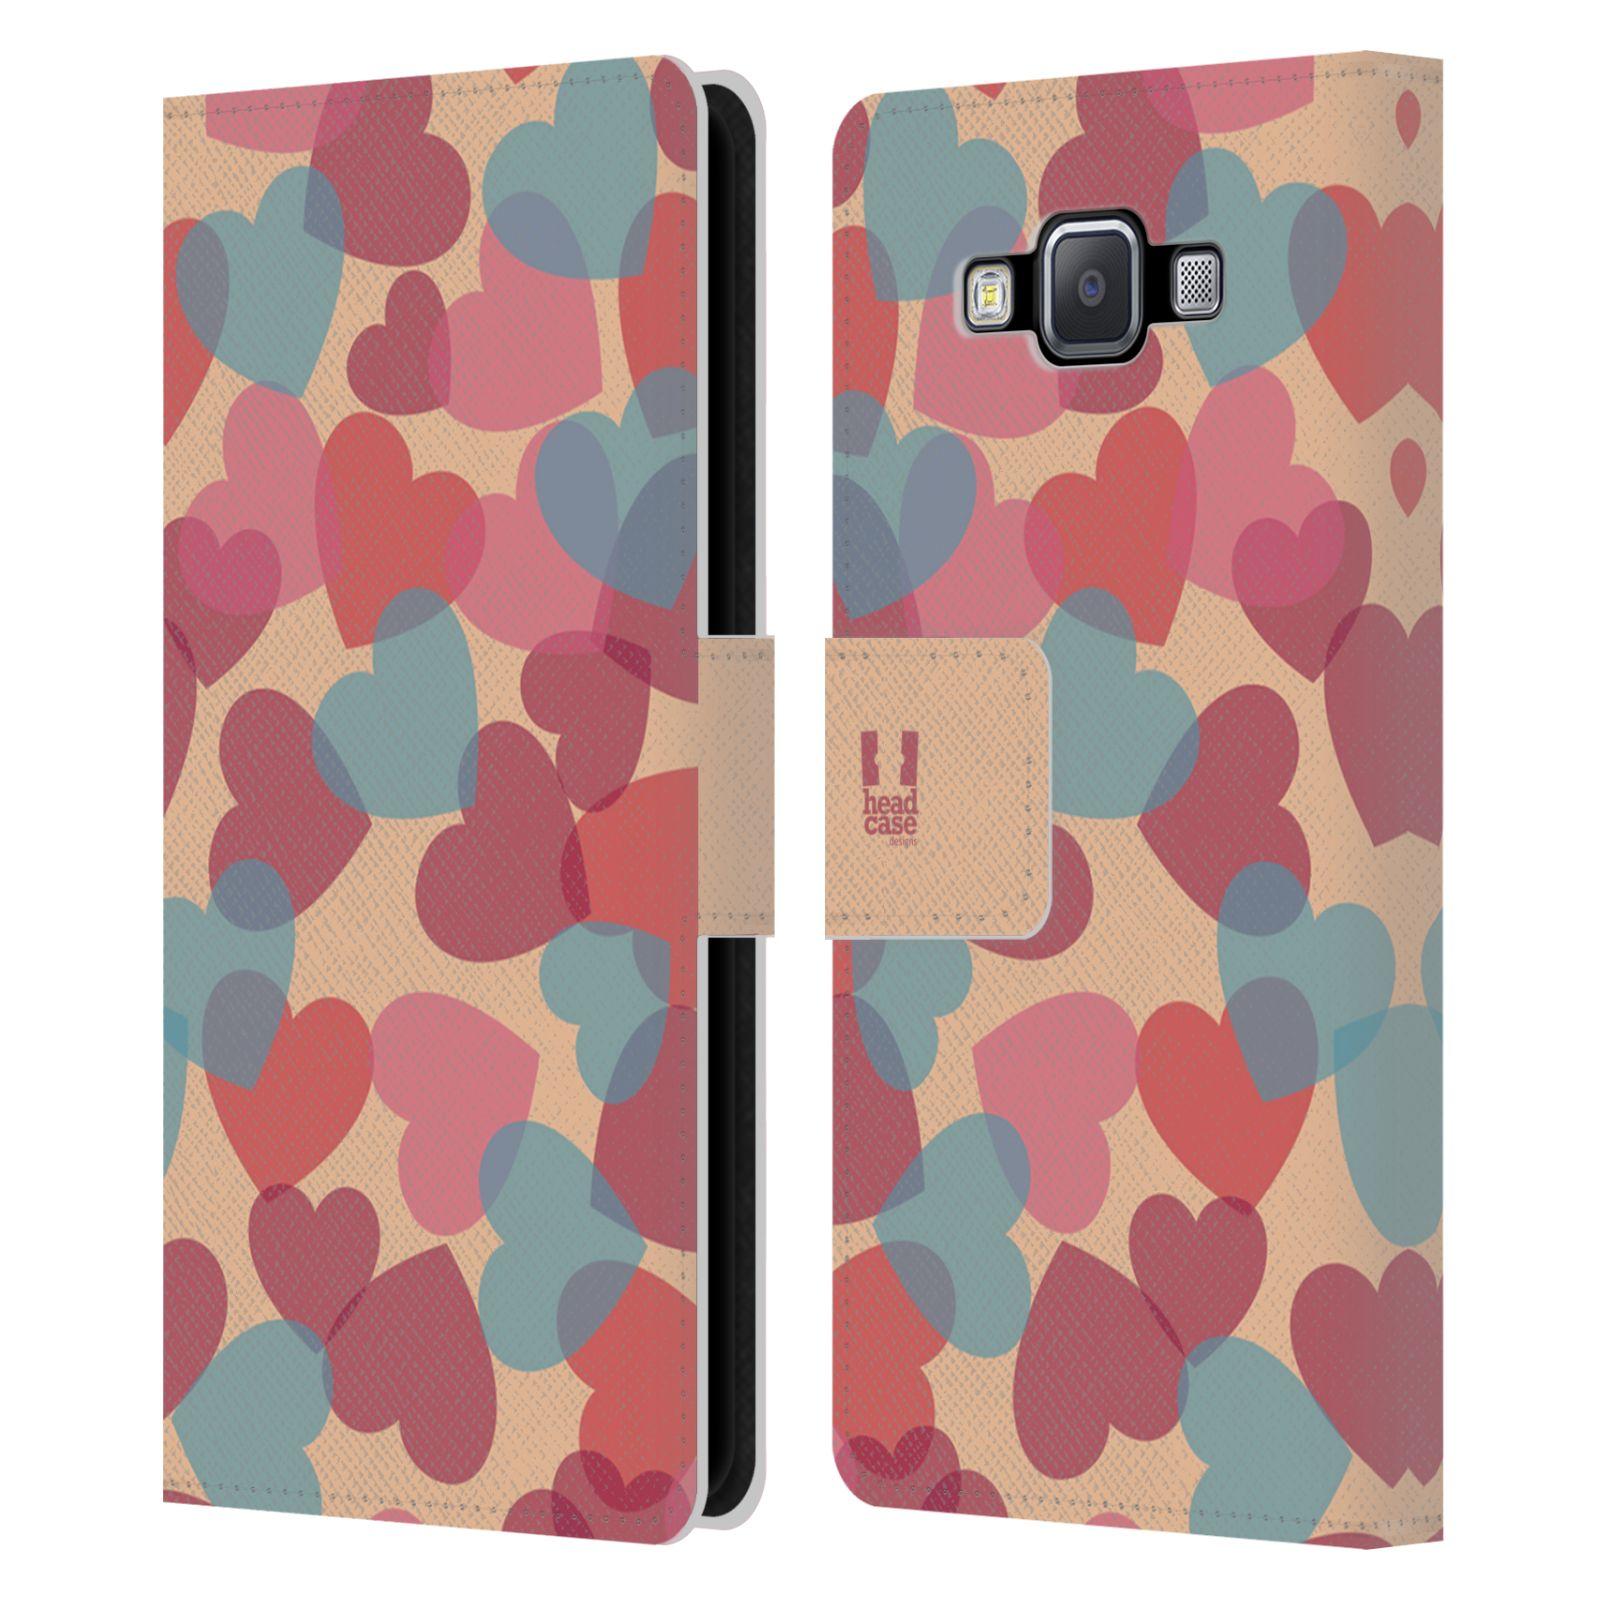 HEAD CASE Flipové pouzdro pro mobil Samsung Galaxy A5 vzor prolínající se srdíčka, srdce, láska, růžová